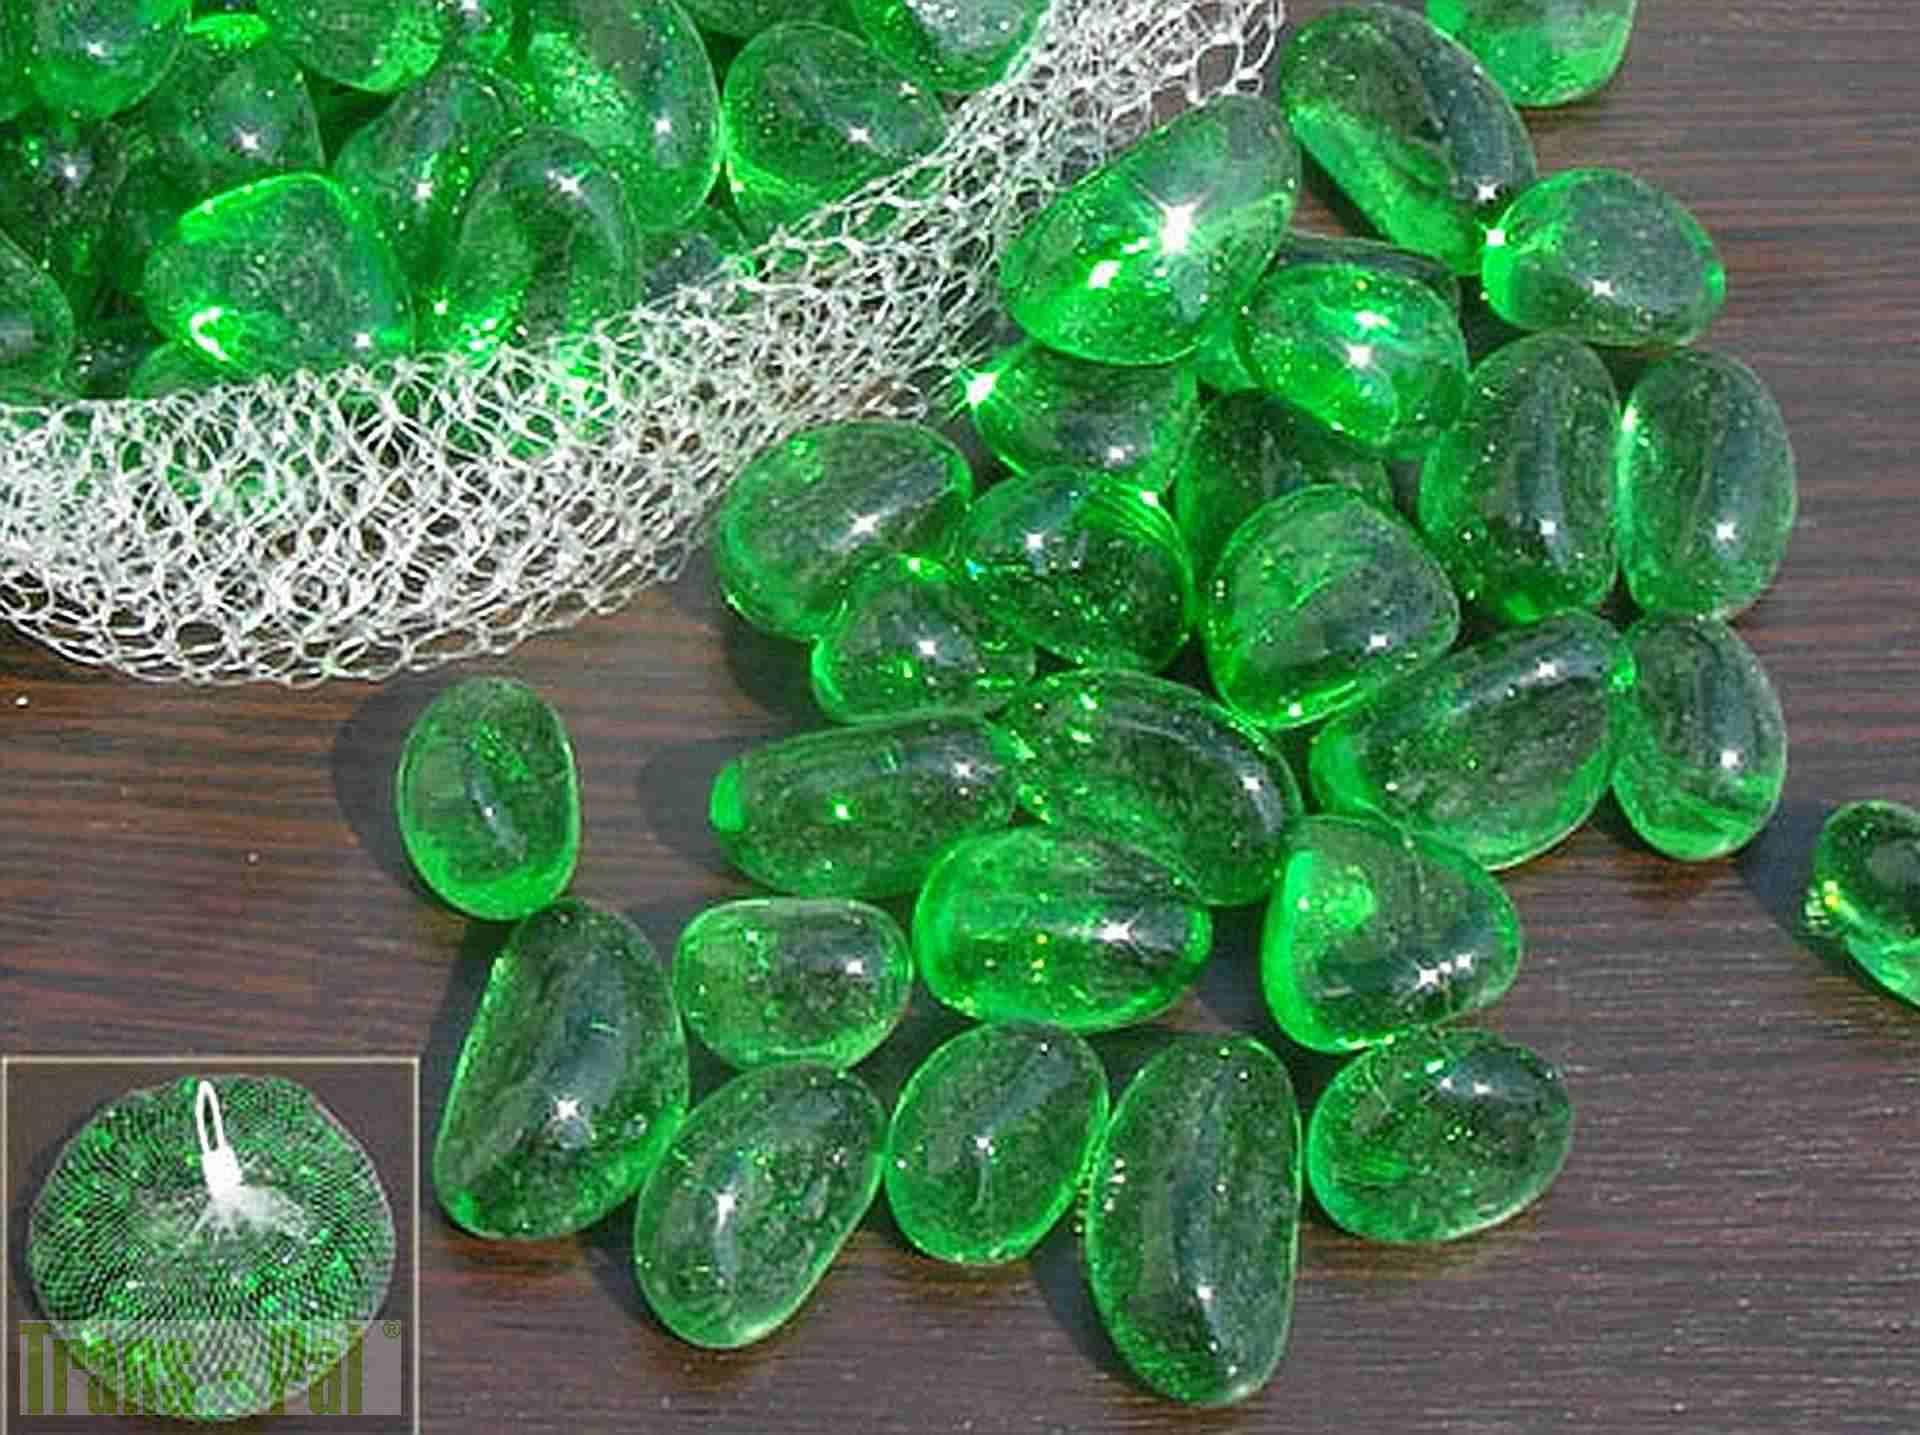 Otaczaki Szklane Zielone